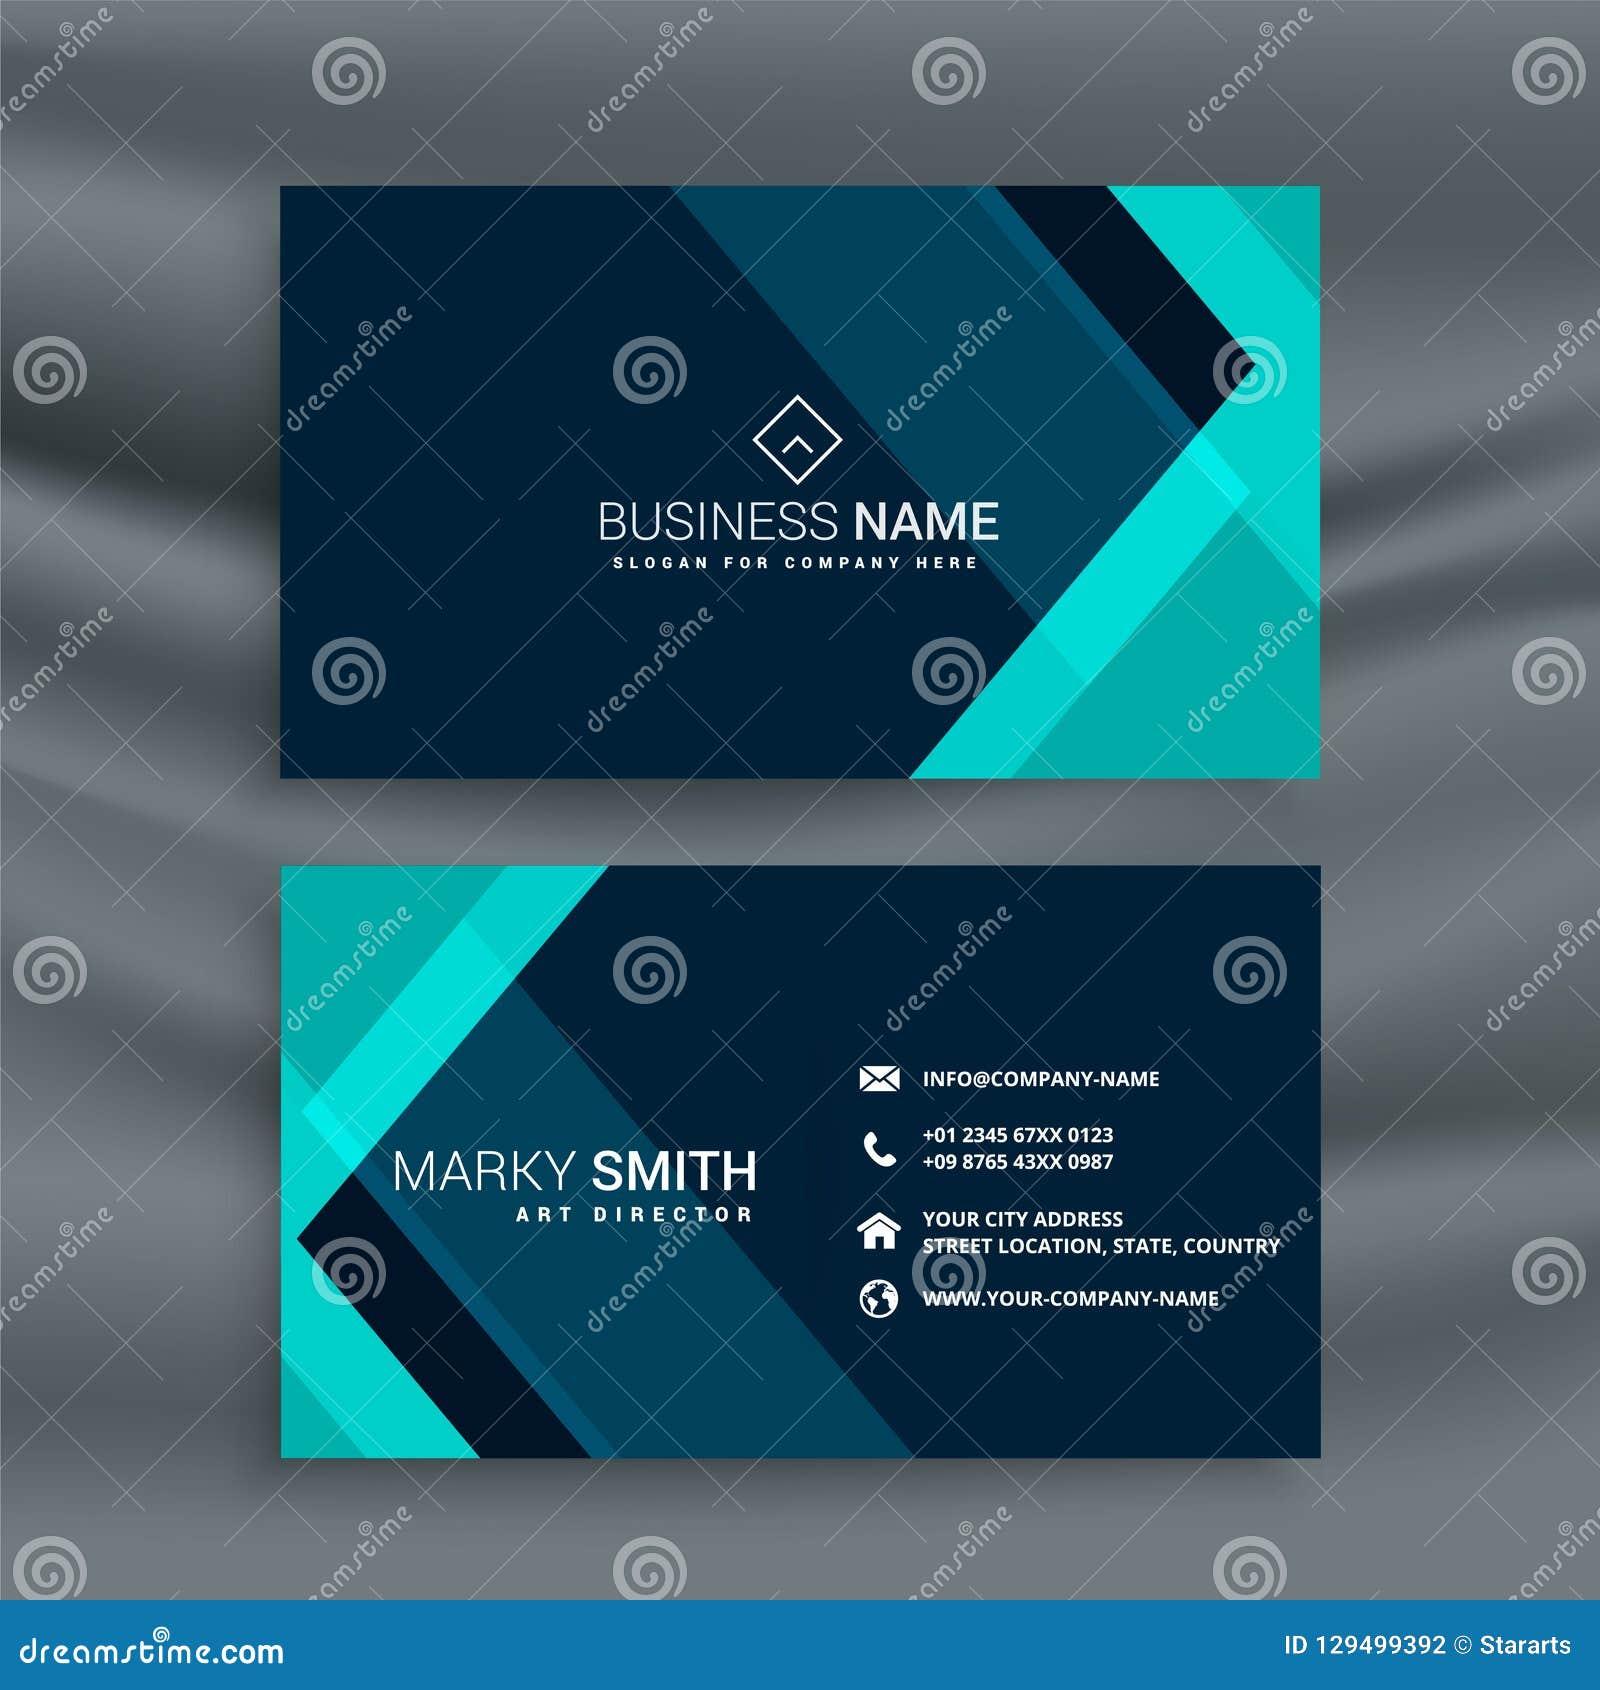 Elegant dark blue business card template